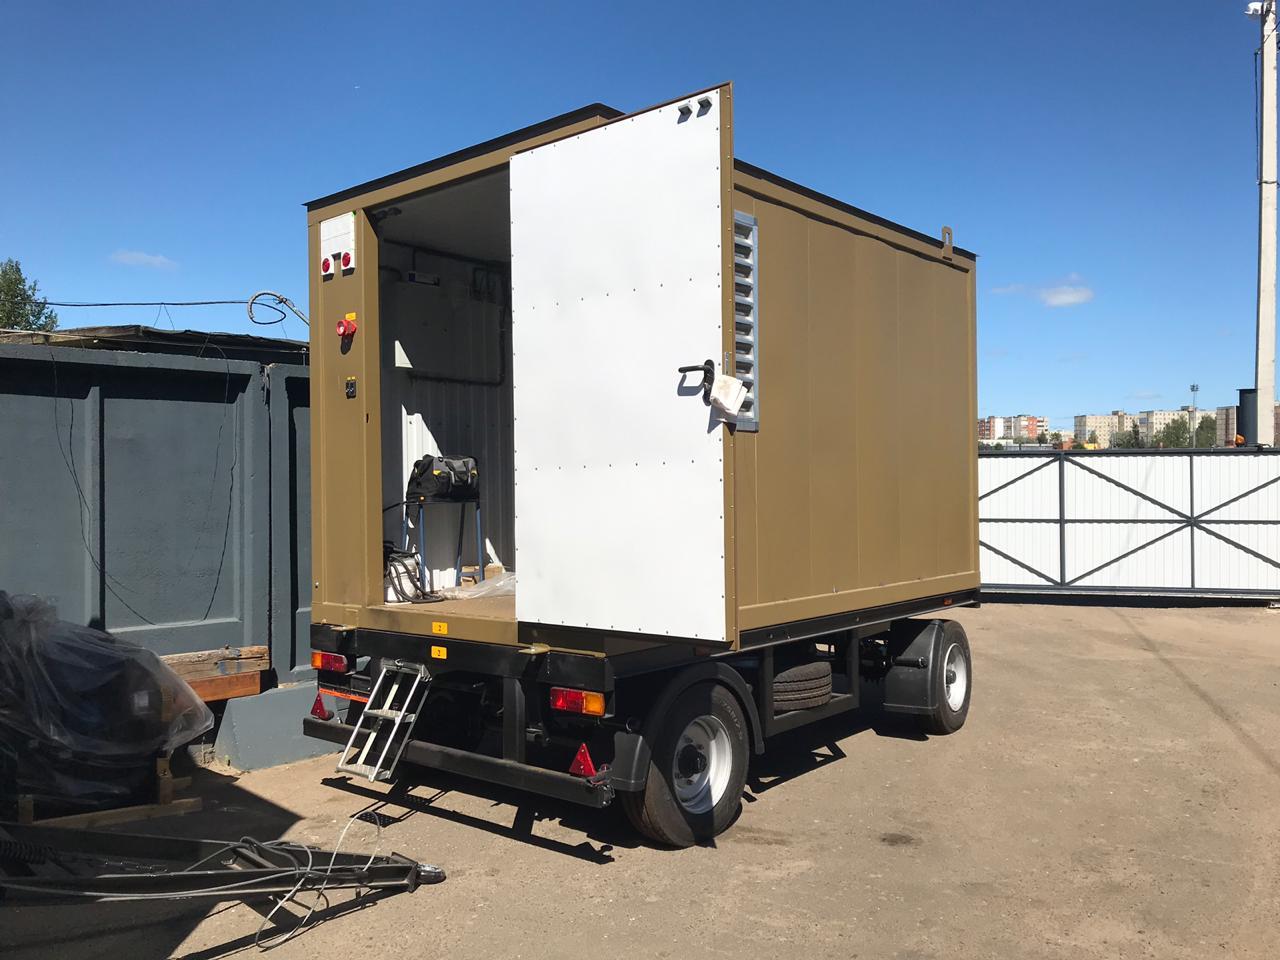 фото АД 250 в контейнере на шасси